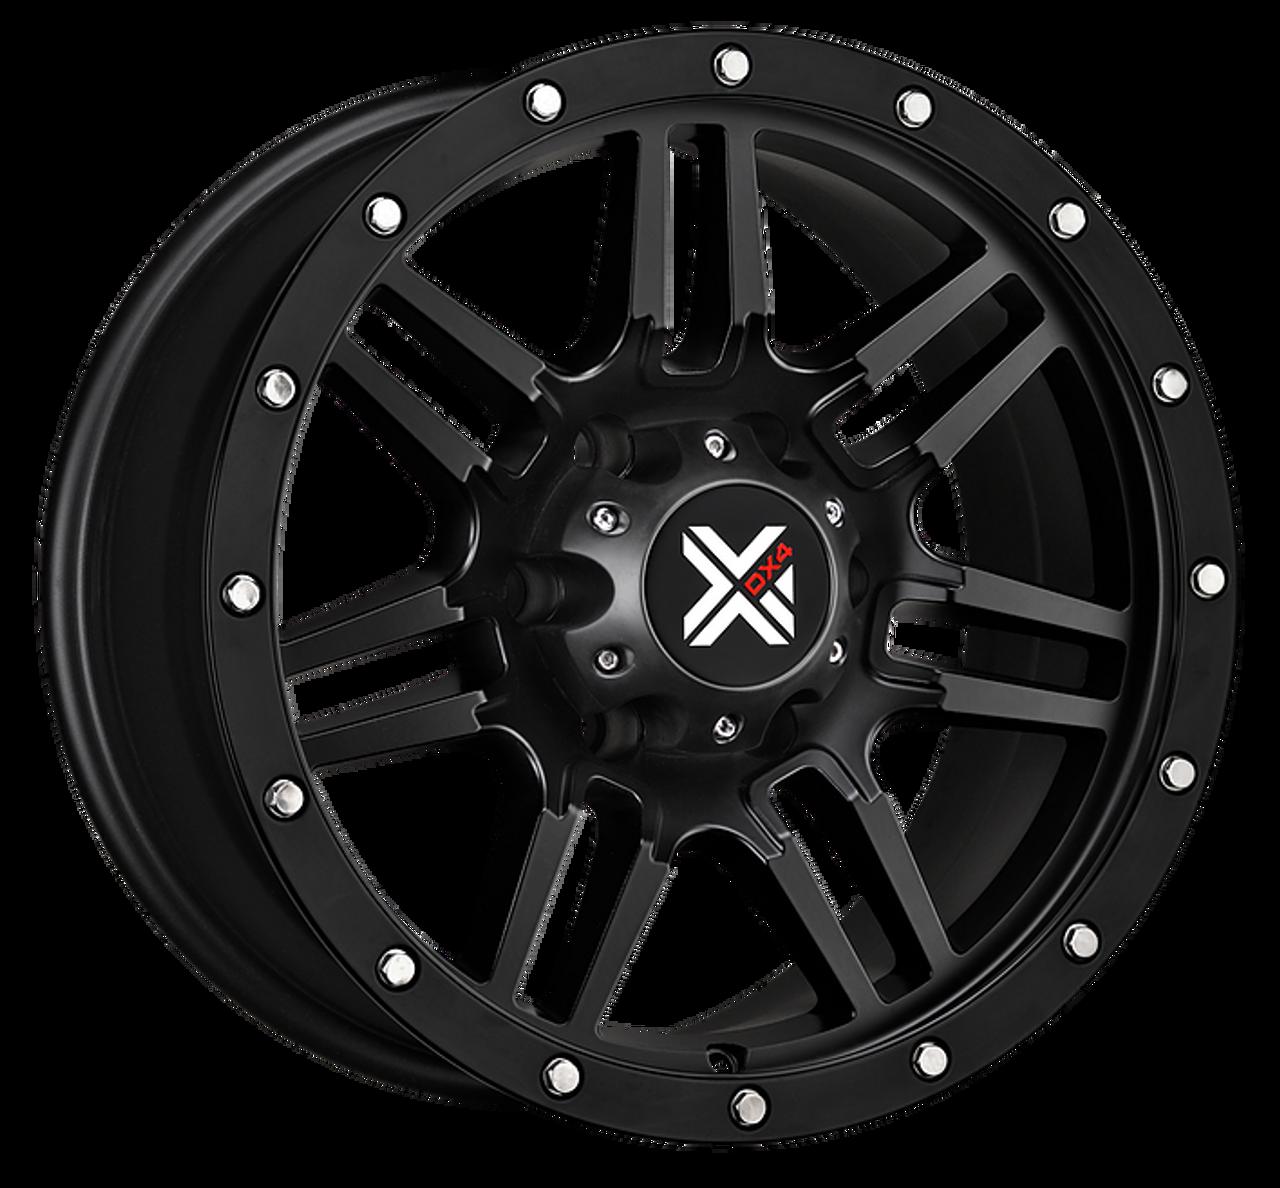 Free Shipping On Dx4 20x9 Type 7s 6x4 72 6 1200mm Matte Black 4x4 Wheels Set Of 4 Wheels